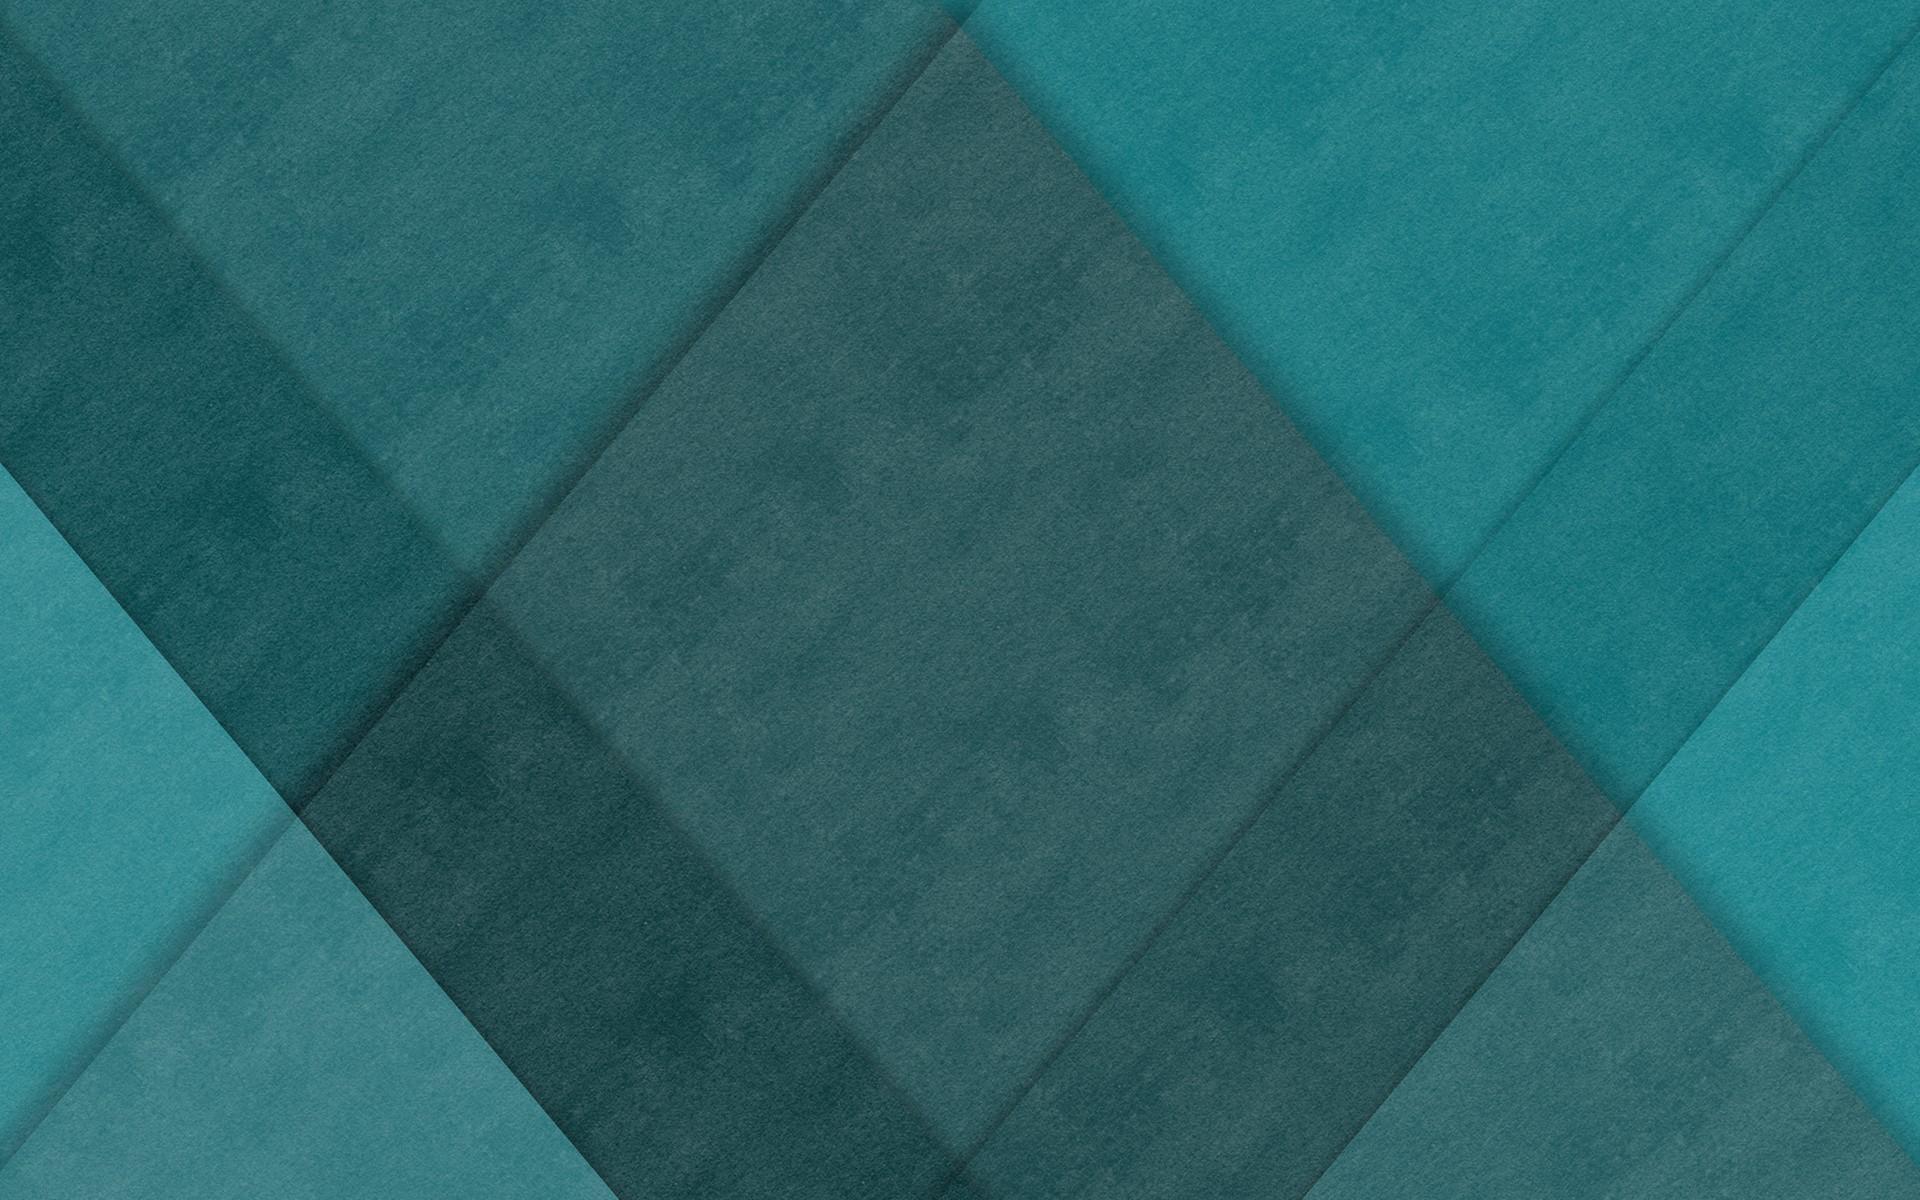 Обои inspired, сине-зеленая, multicolor, геометрия